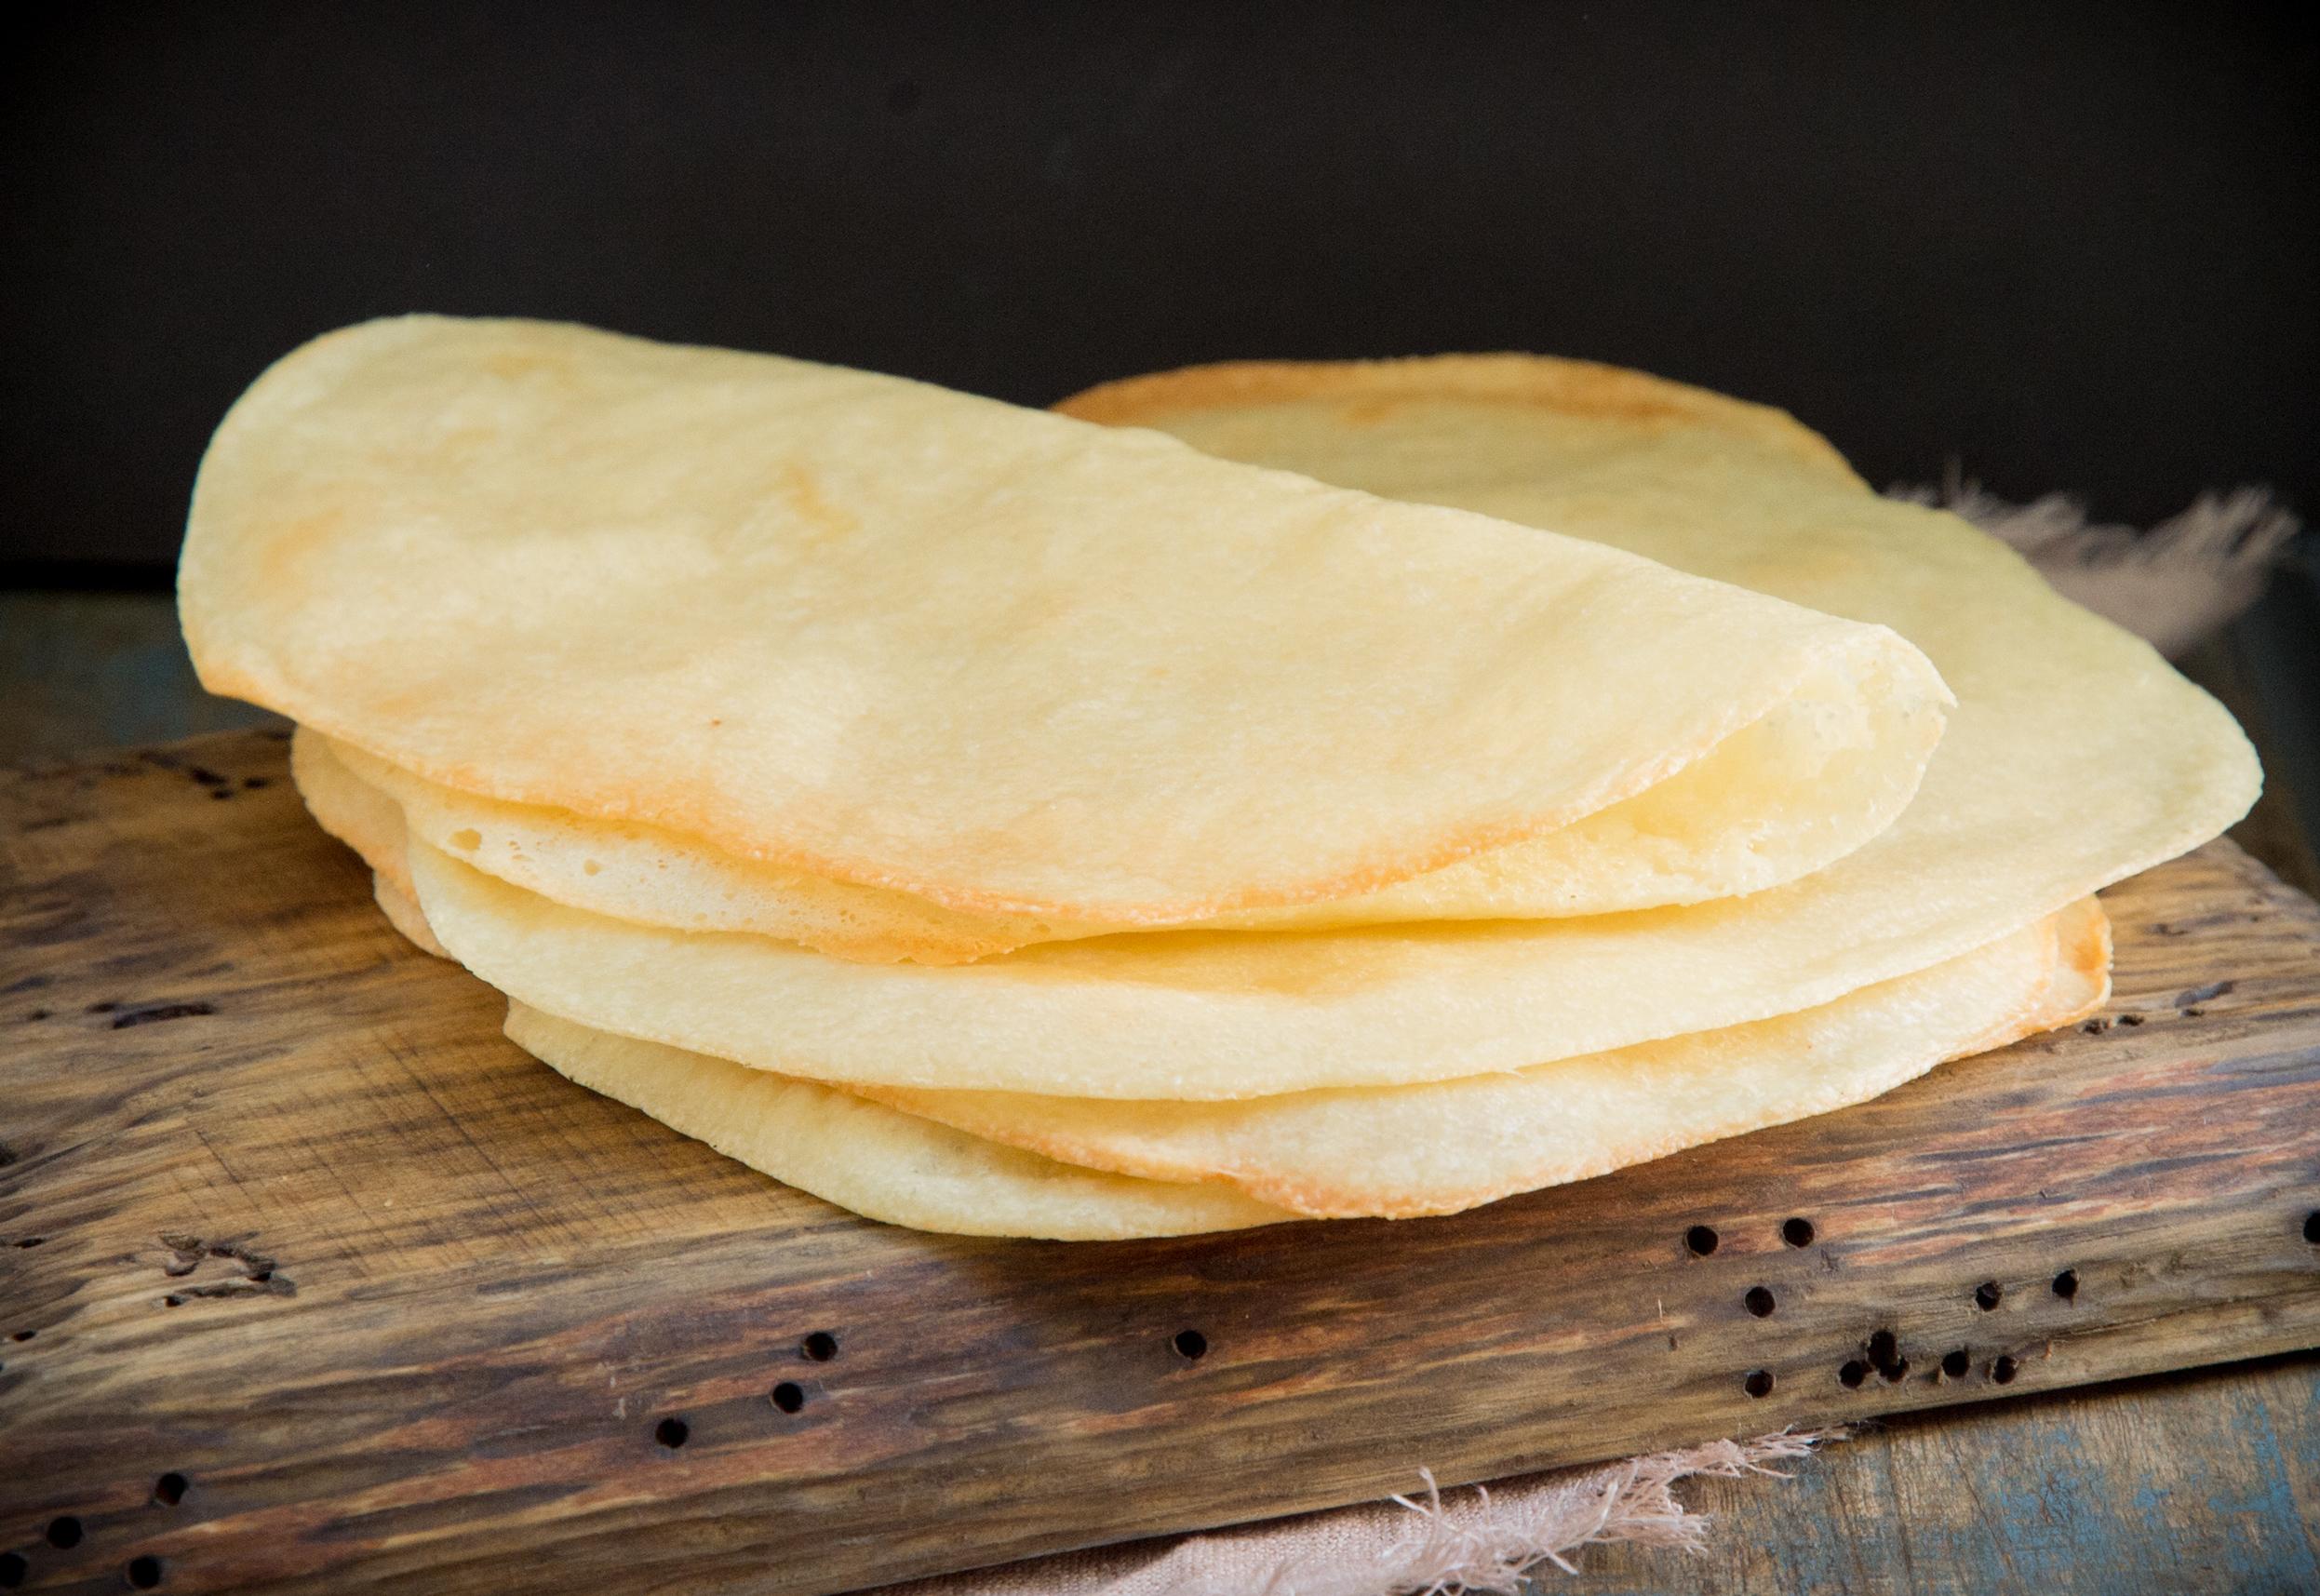 Homemade Low-Carb Tortillas Recipe - Simply So Healthy